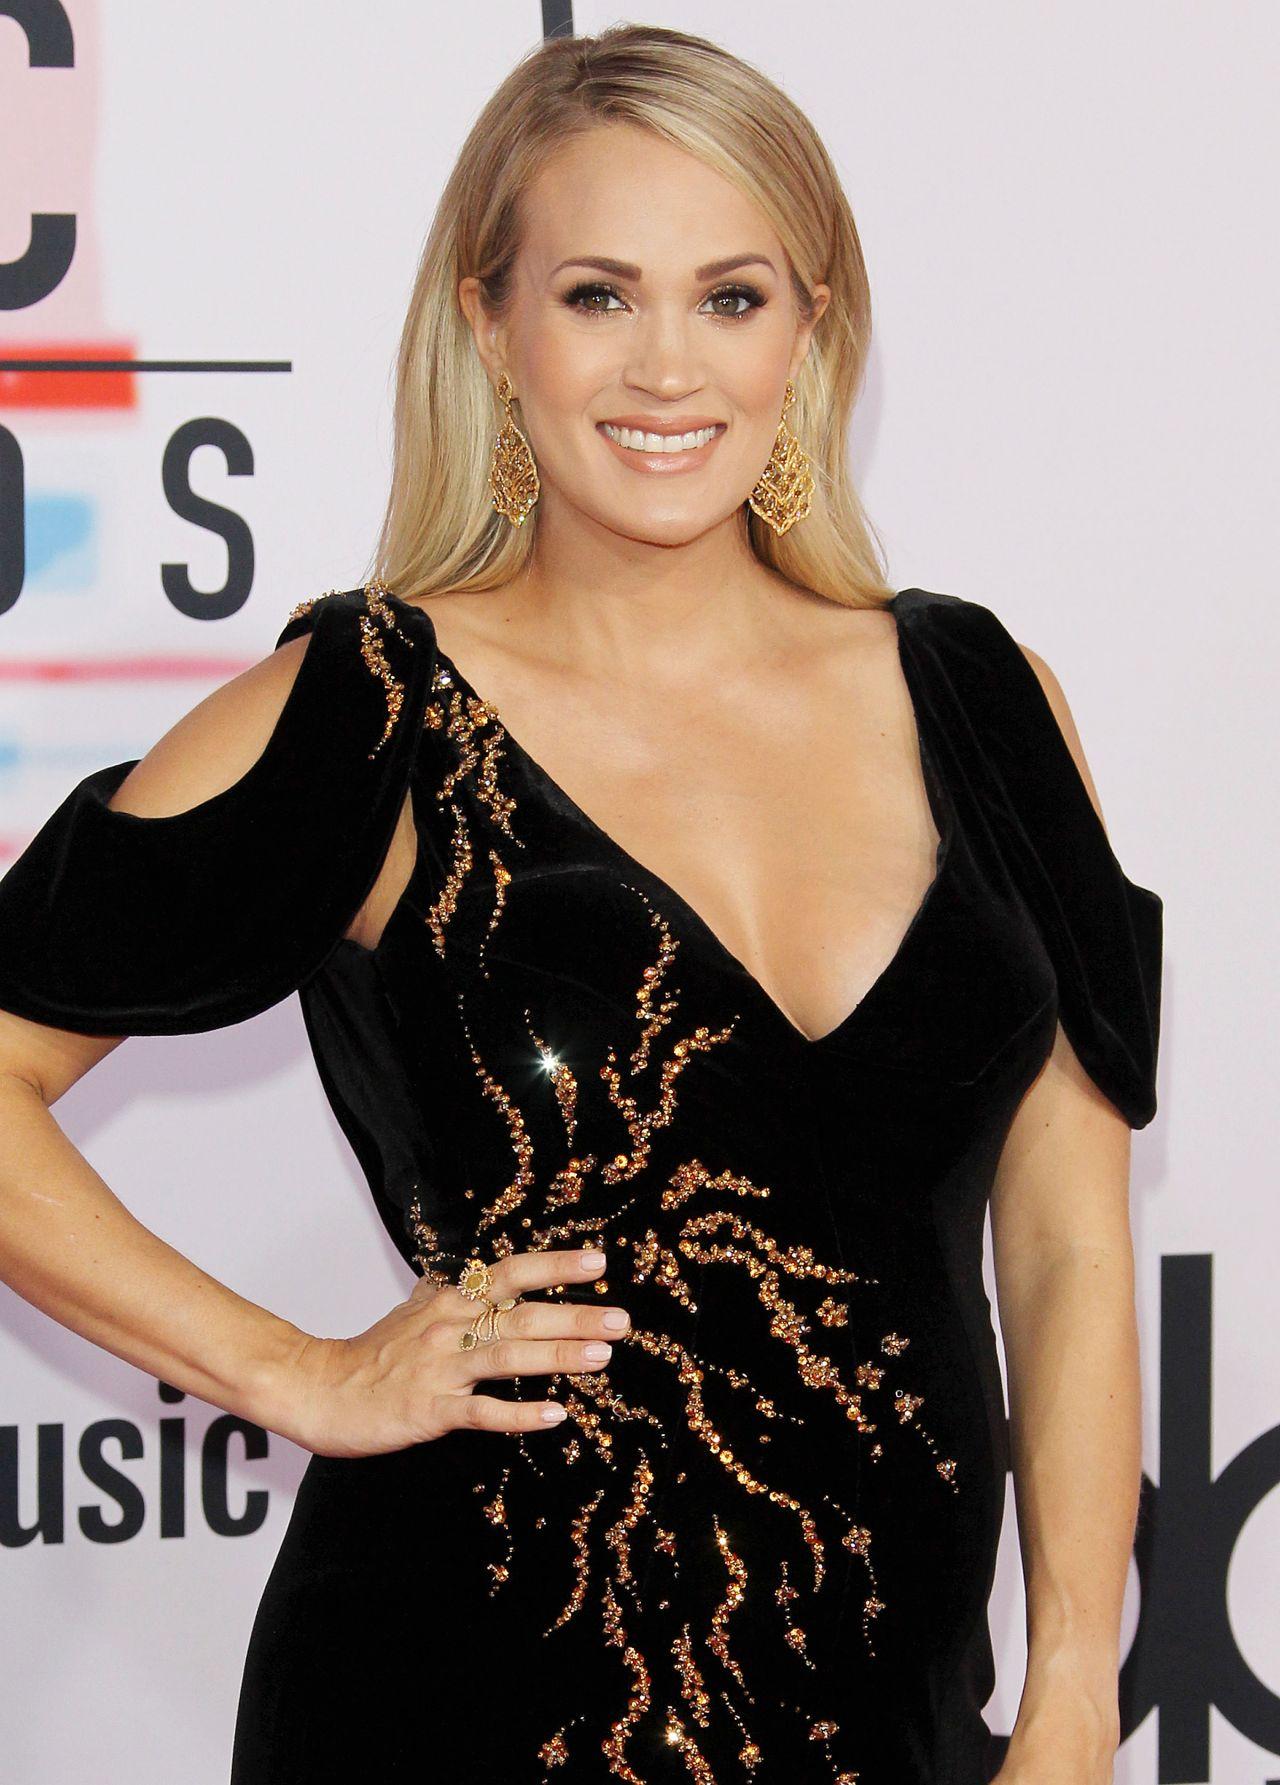 Carrie Underwood - 2018 American Music Awards in Los